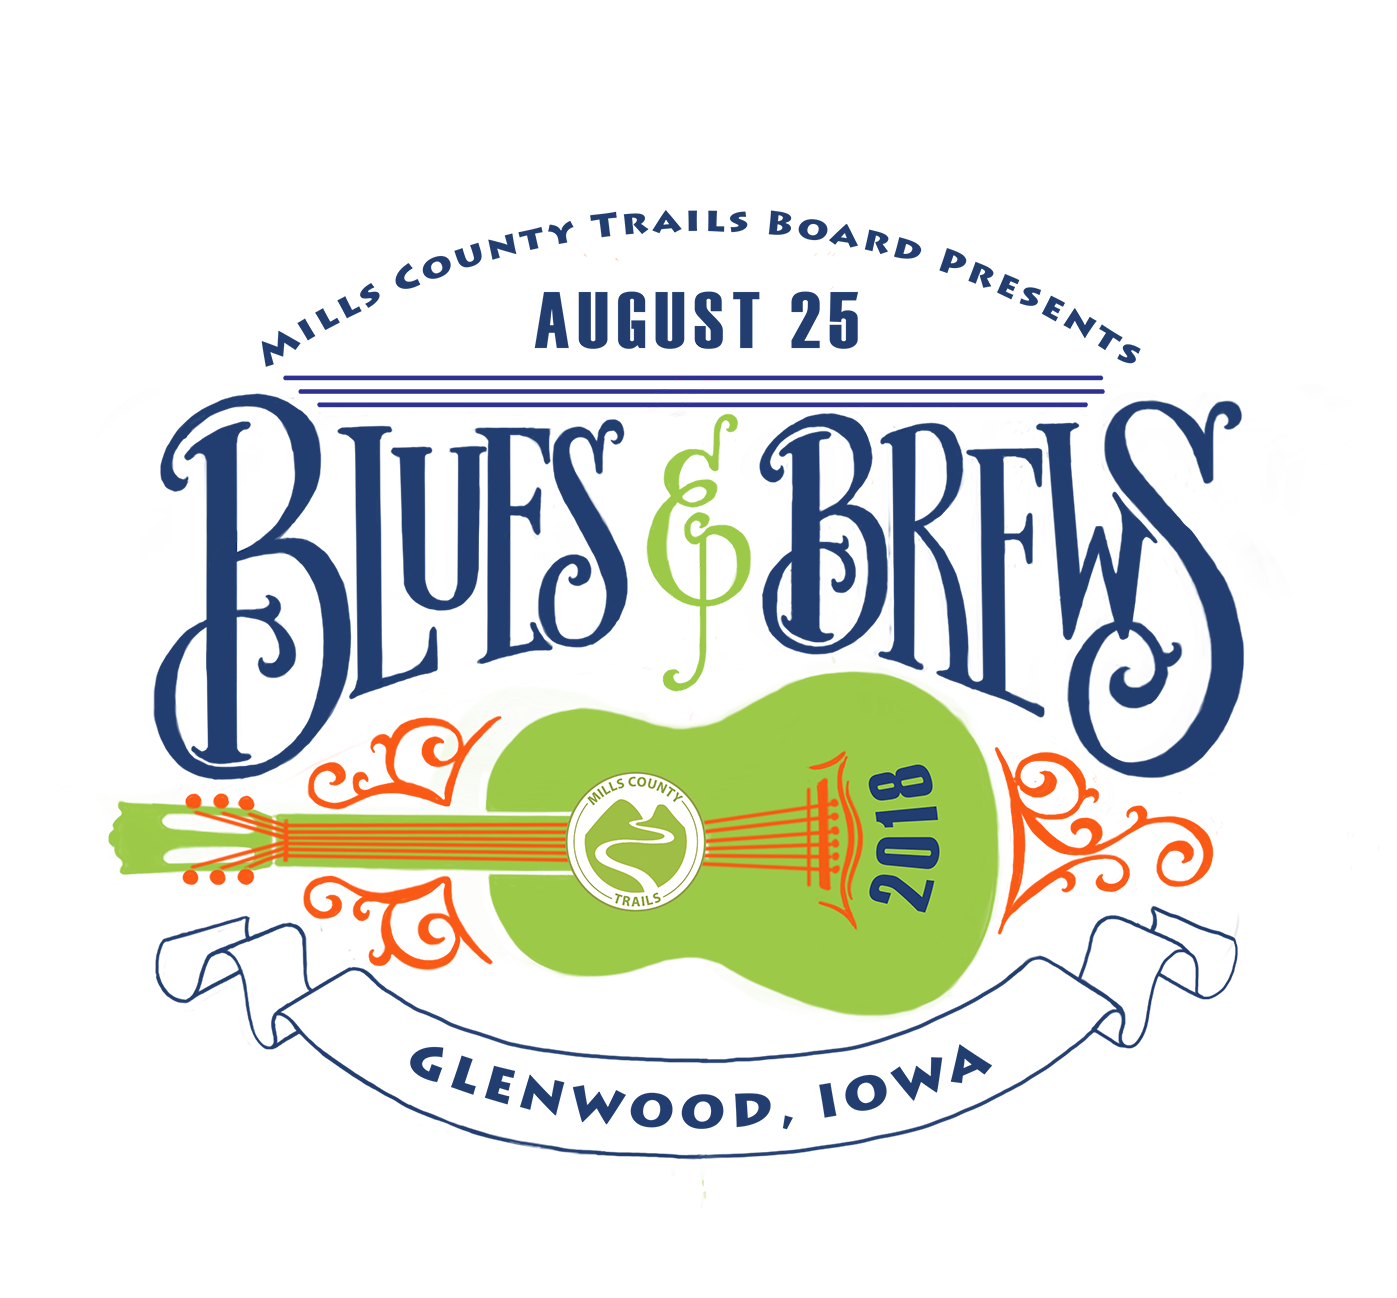 Brews_blues_logo4_2018_no_background_copy